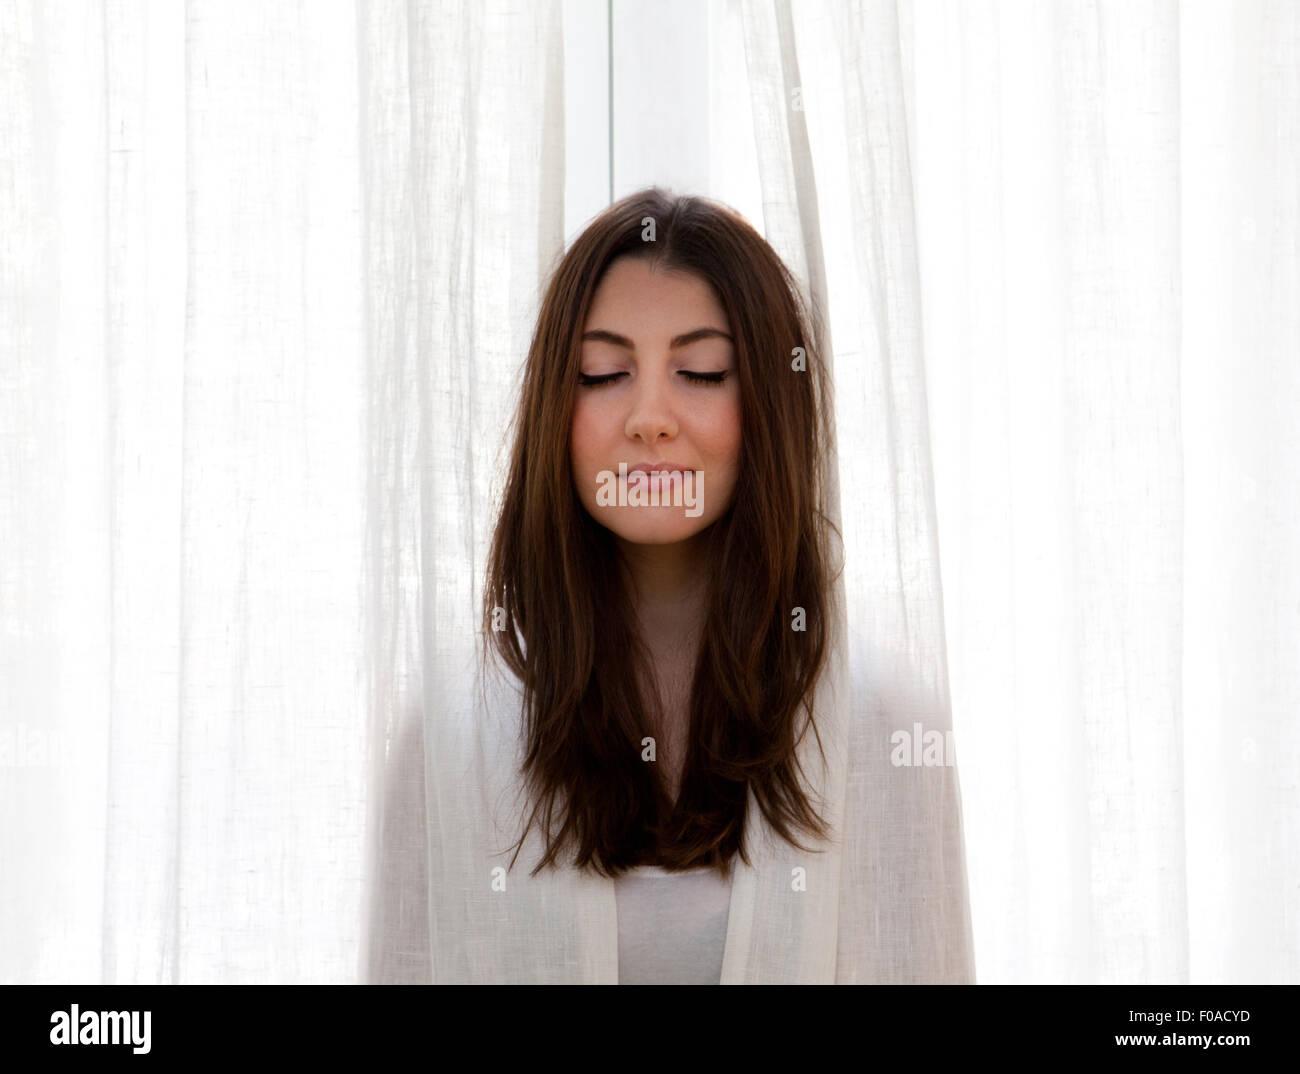 Junge Frau Stossen-Kopf aus Vorhängen, Augen geschlossen Stockbild